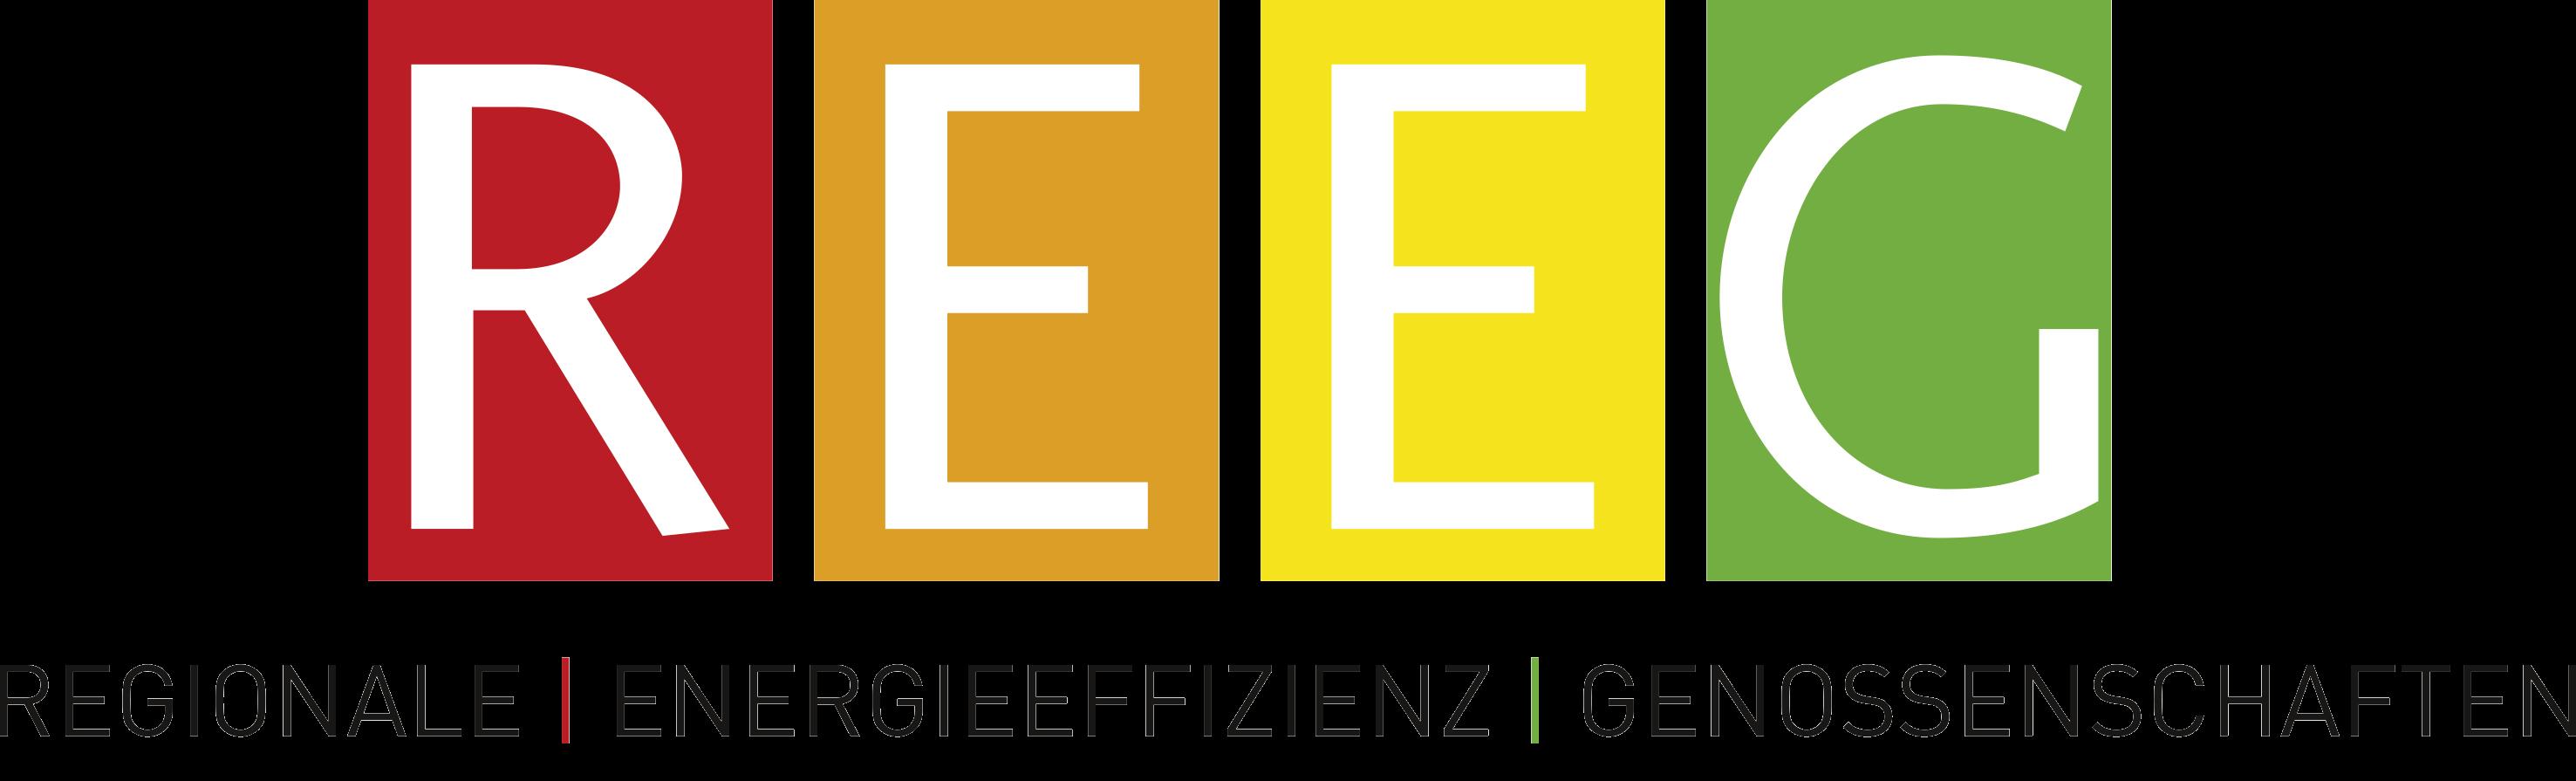 Logo REEG